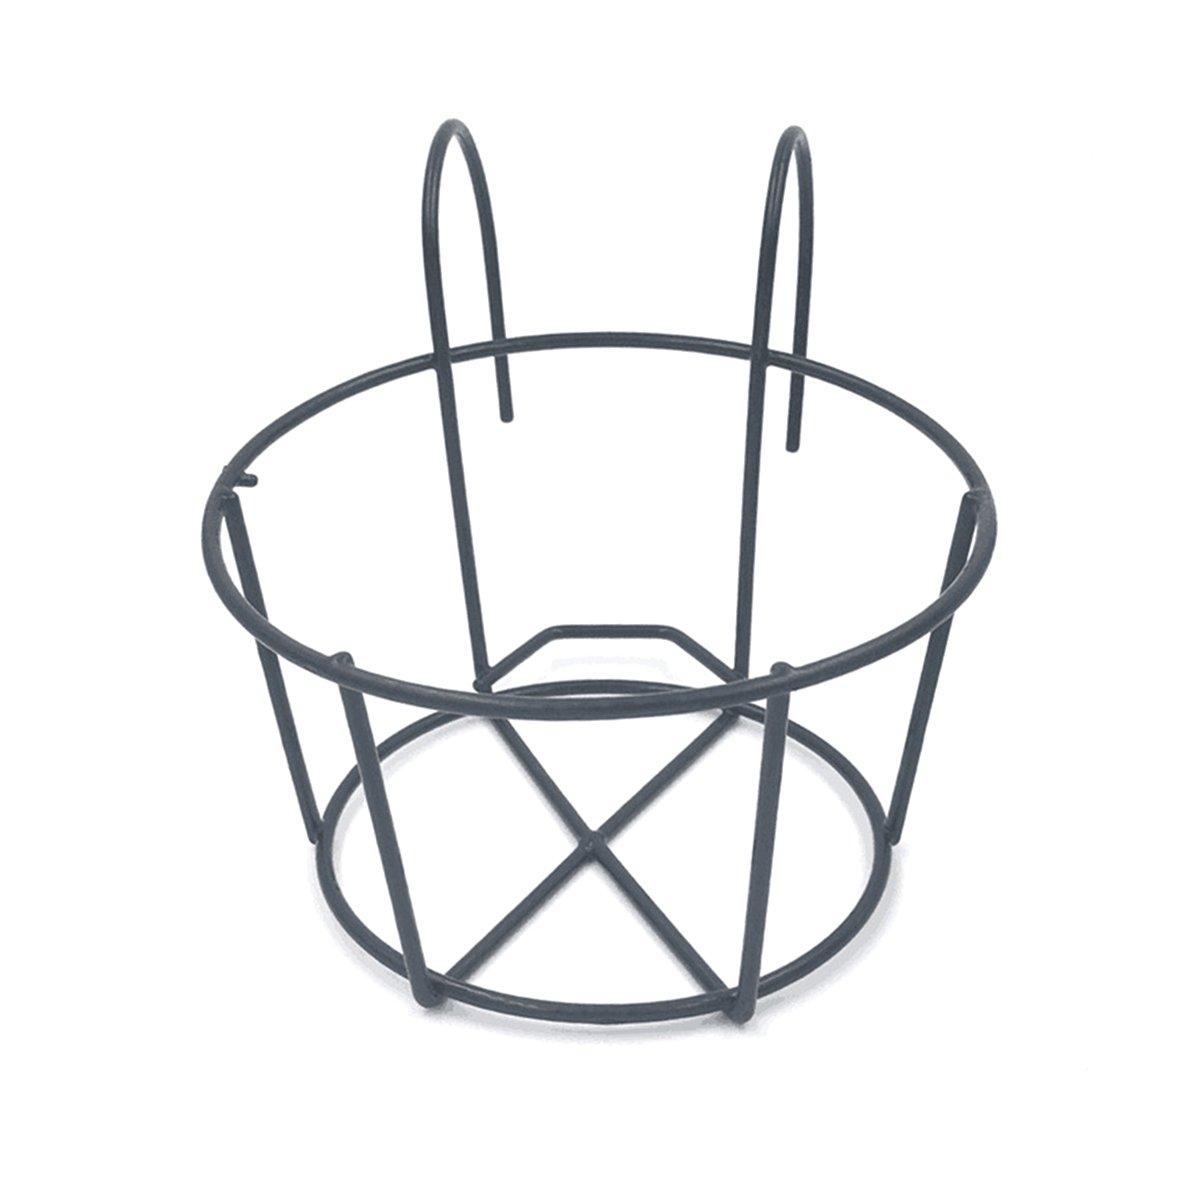 Negro ounona barandilla de hierro soporte de macetas Distressed Flores Planta estante estantes para casa jard/ín Balc/ón decoraci/ón/ /Tama/ño L